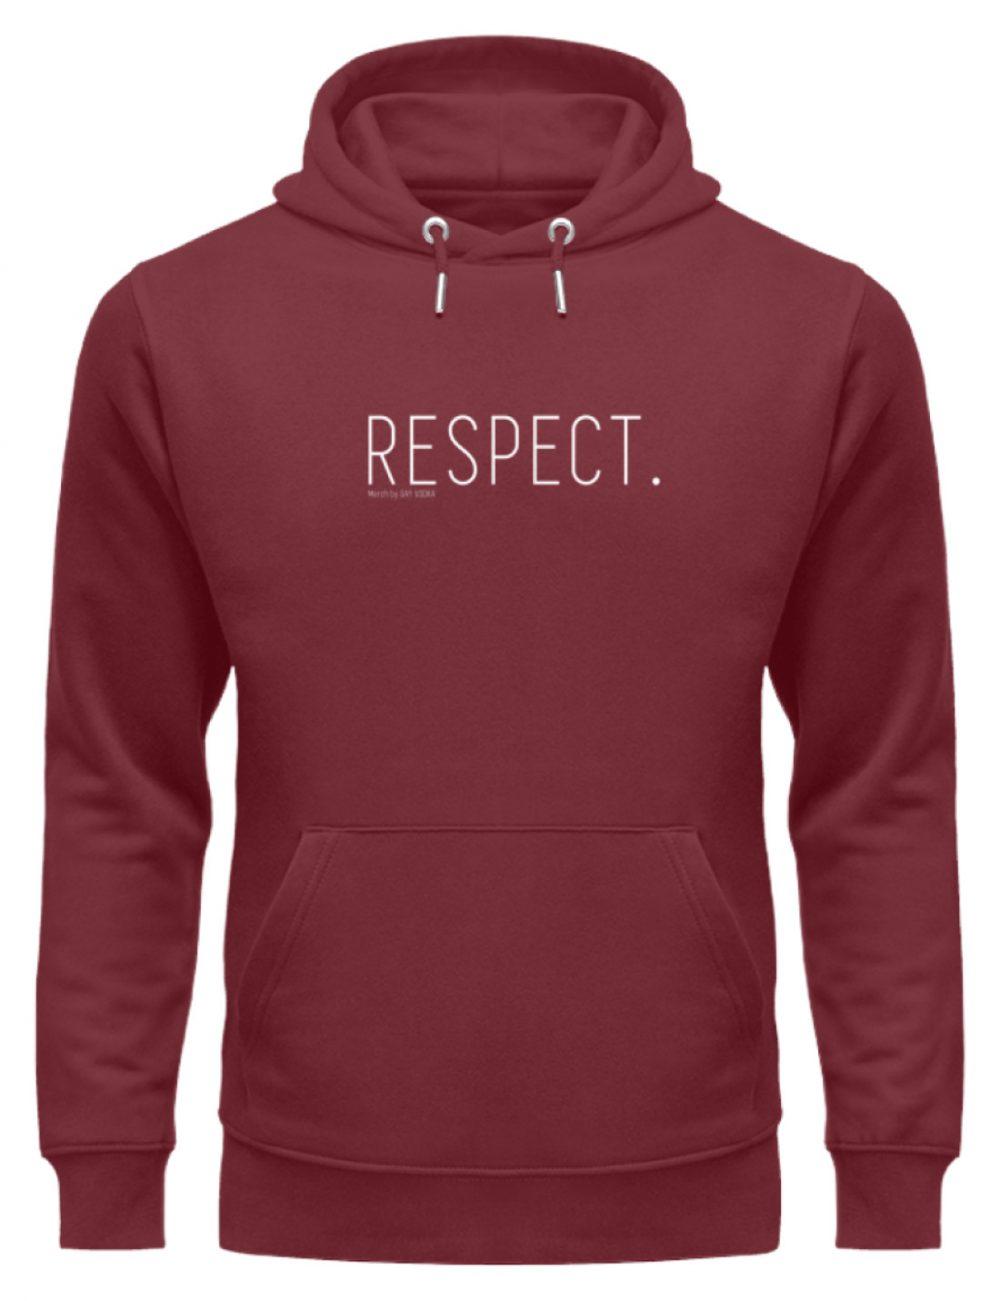 RESPECT. - Unisex Organic Hoodie-6883